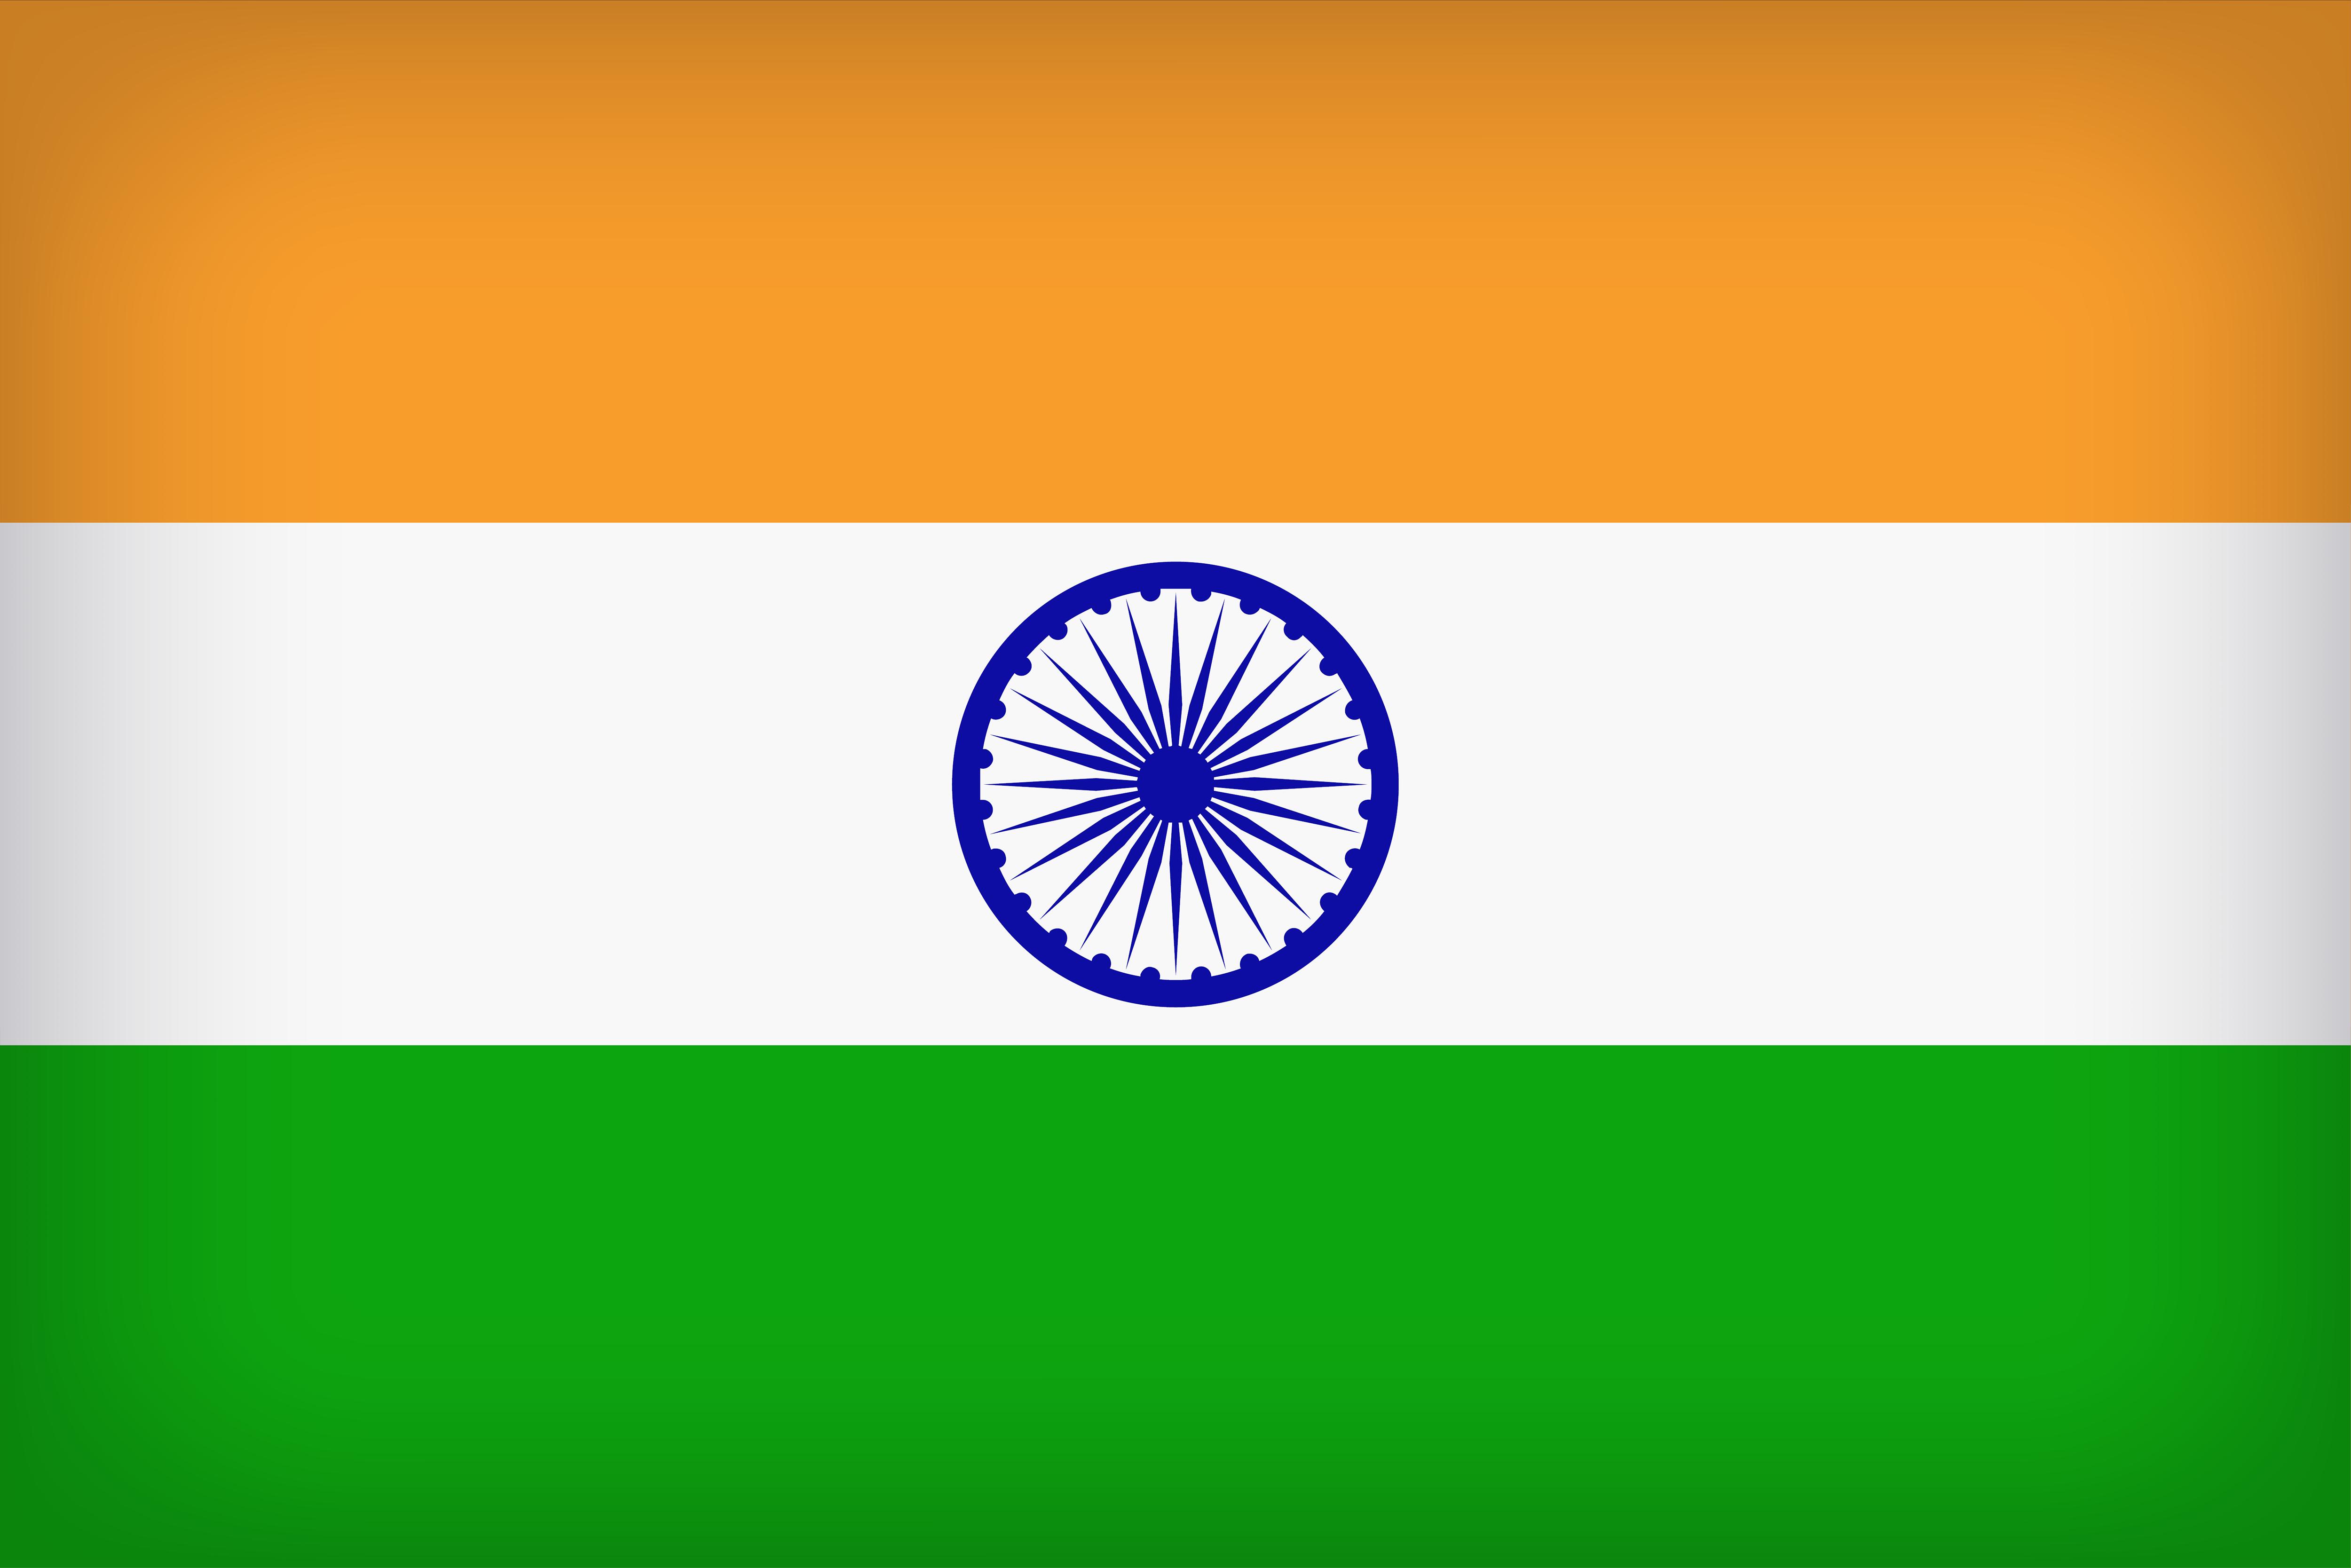 The National Flag Of India 4k Ultra Fondo De Pantalla Hd